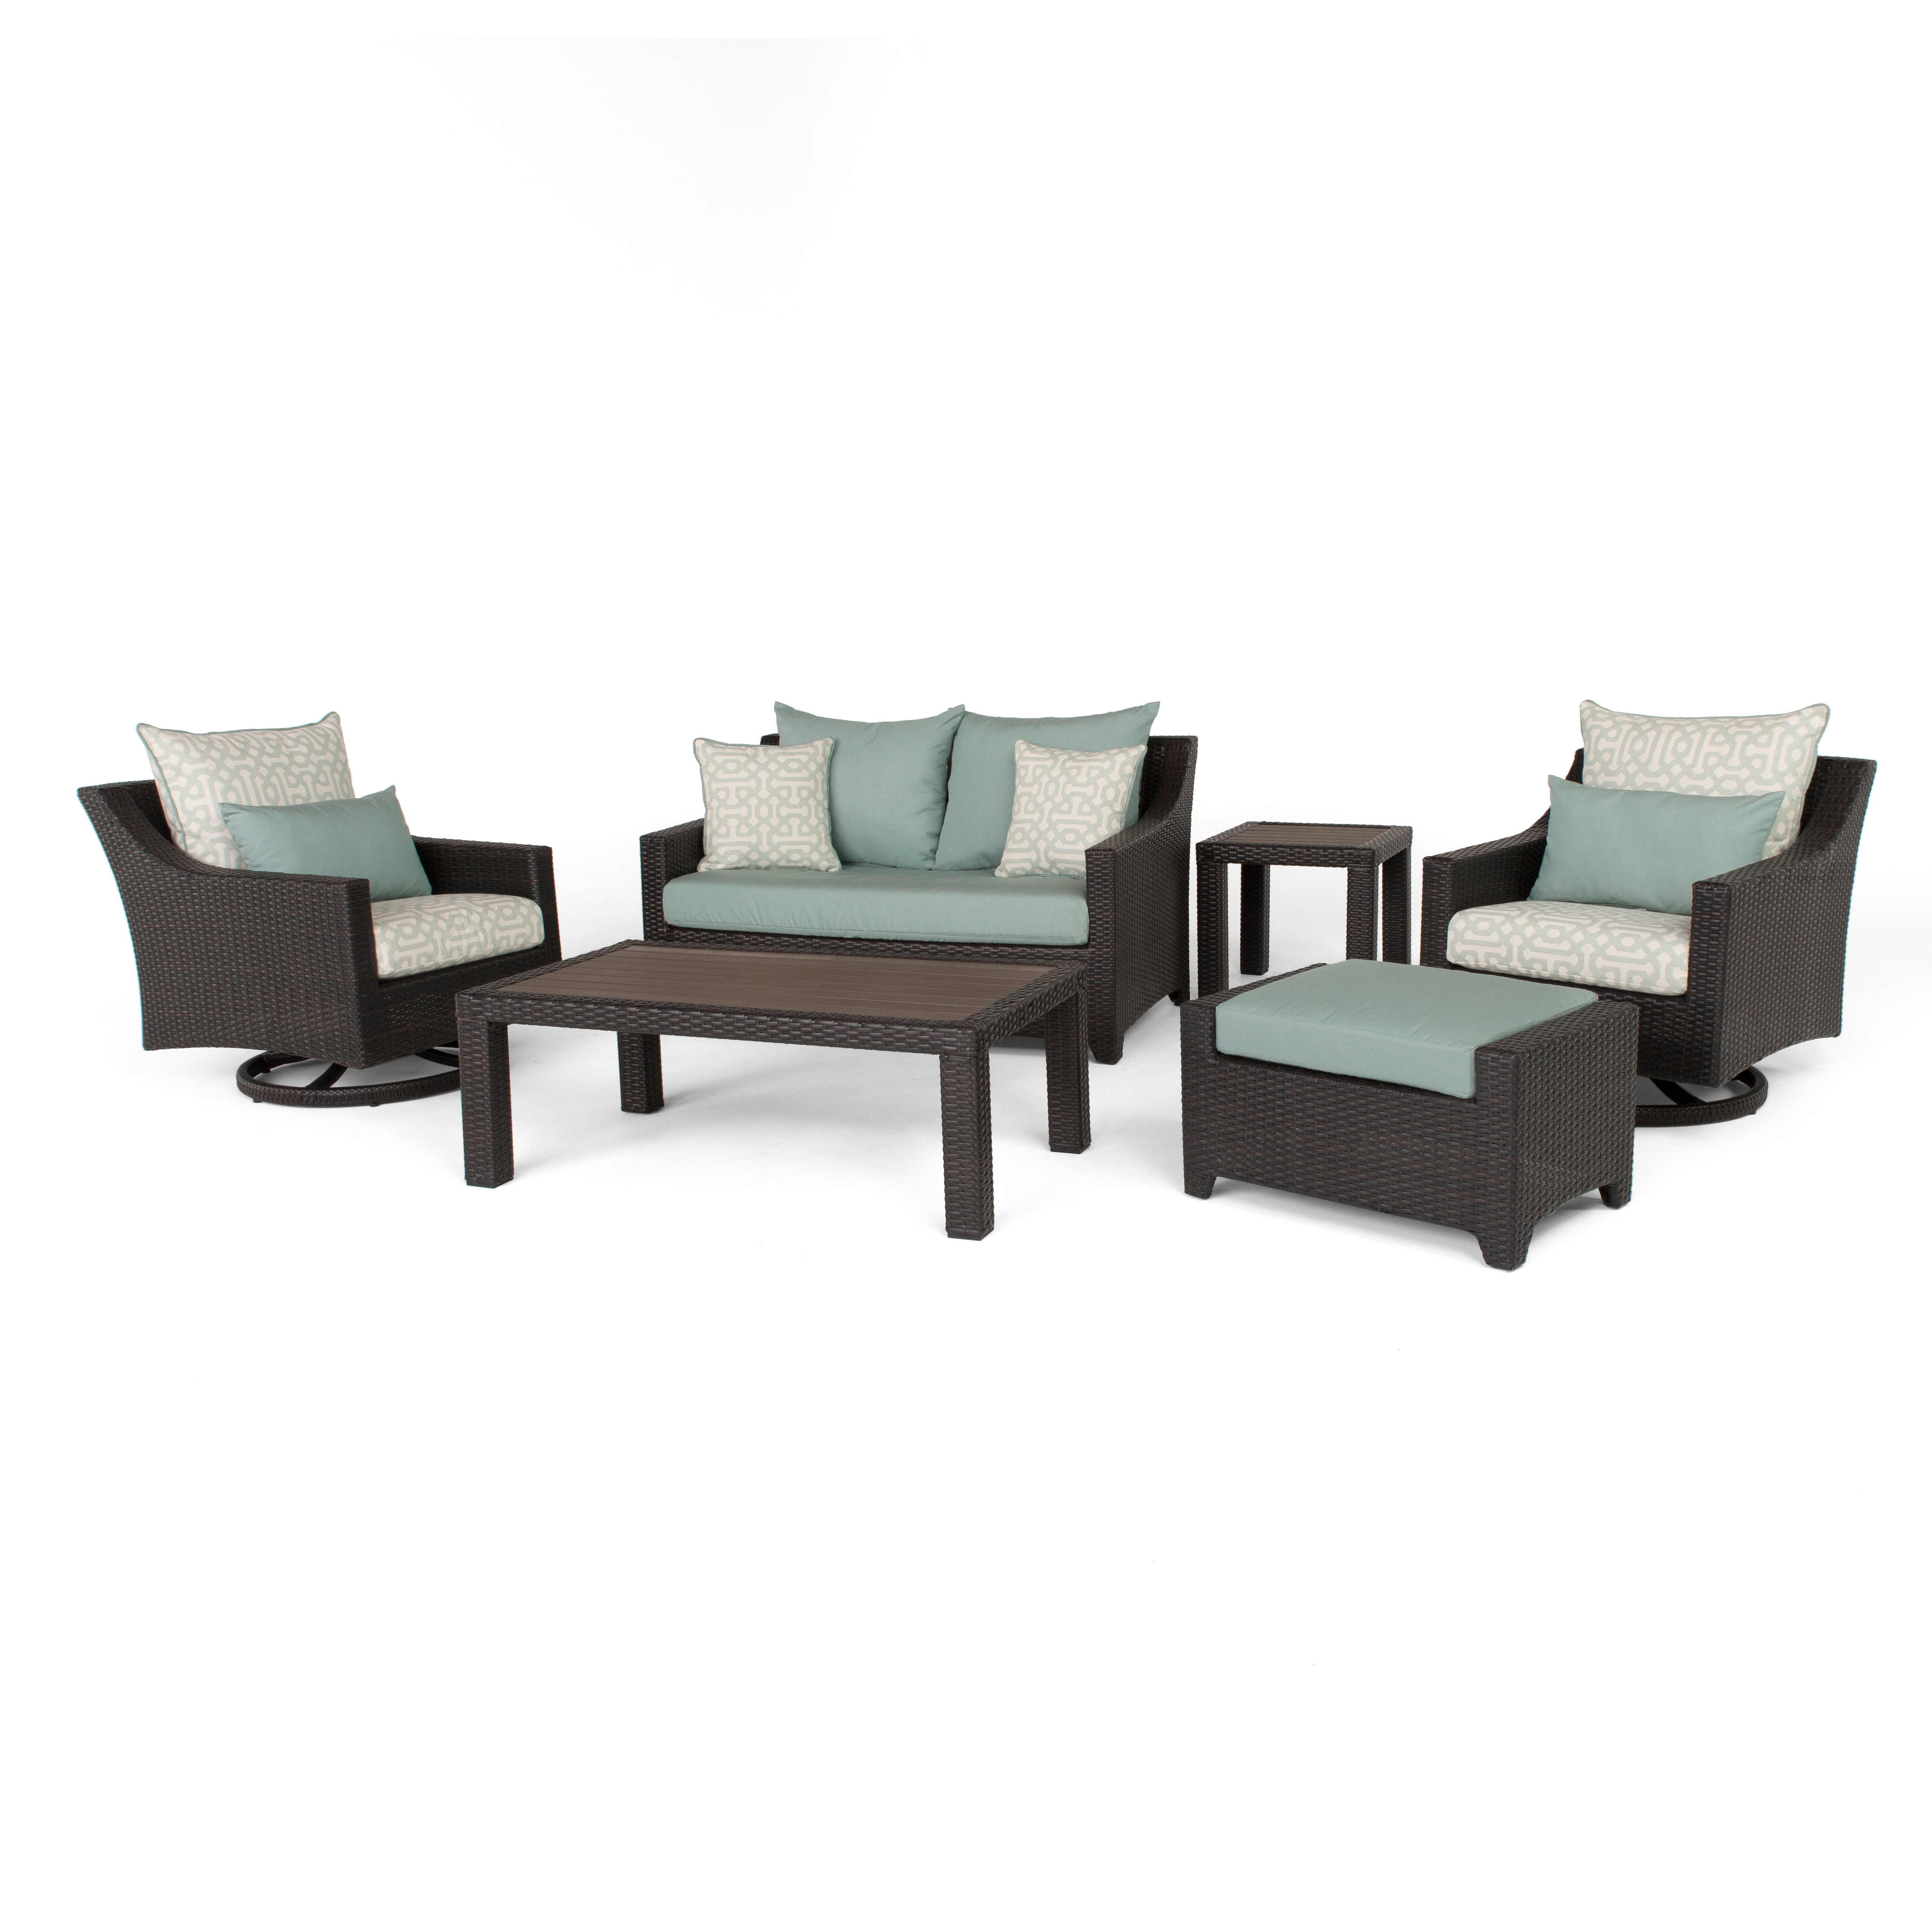 Most Recent Northridge 6 Piece Sunbrella Sofa Set With Cushions Throughout Northridge Patio Sofas With Sunbrella Cushions (View 9 of 20)